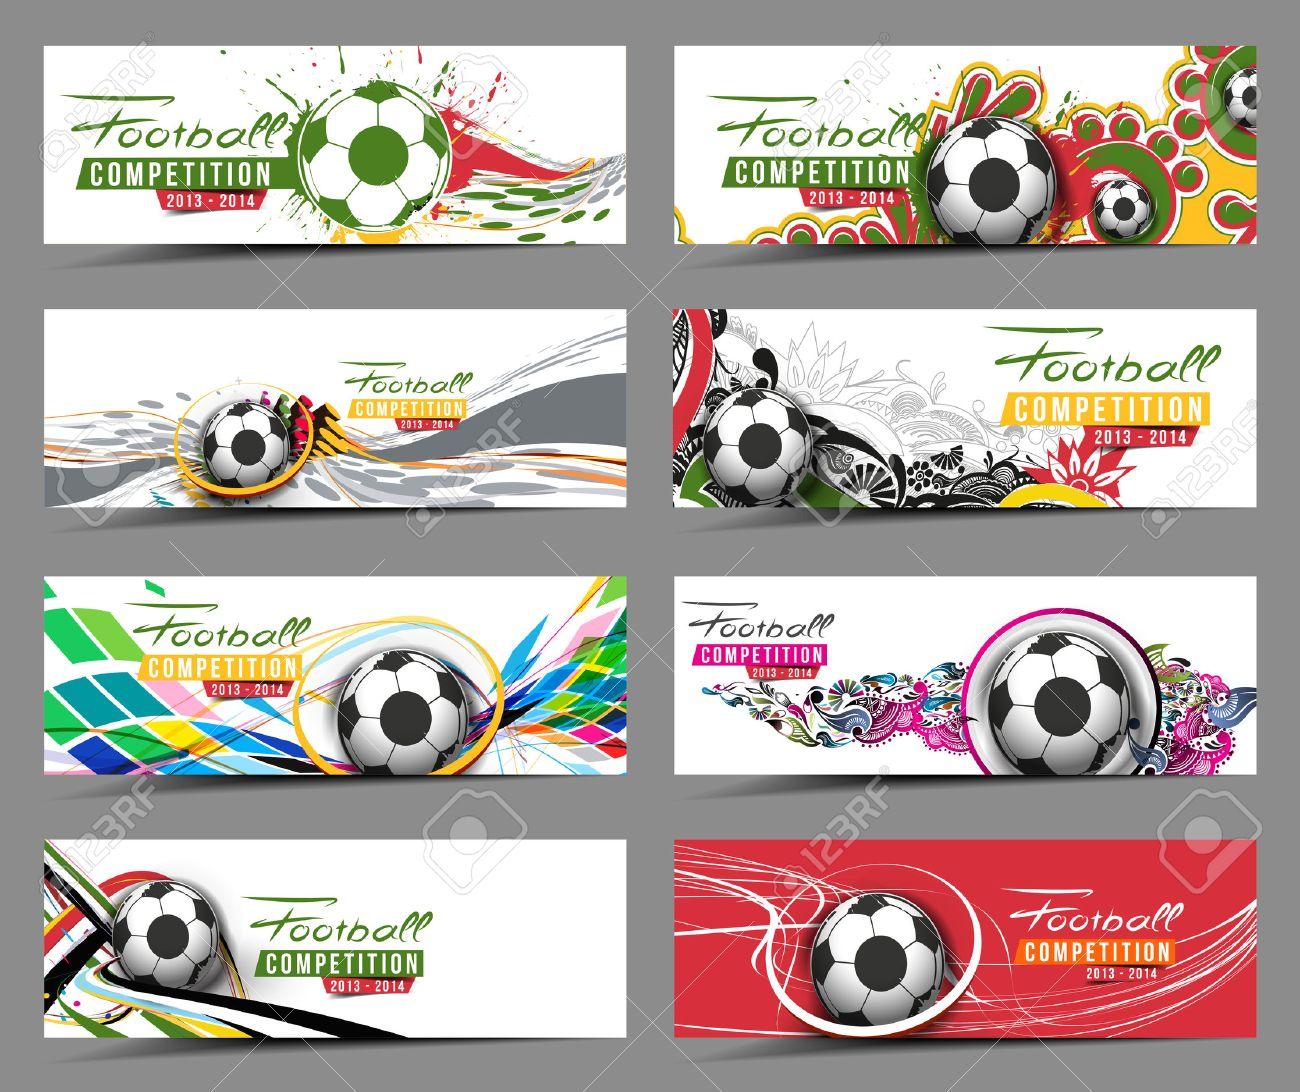 Set of Football Event Banner Header Ad Template Design. Stock Vector - 38435106